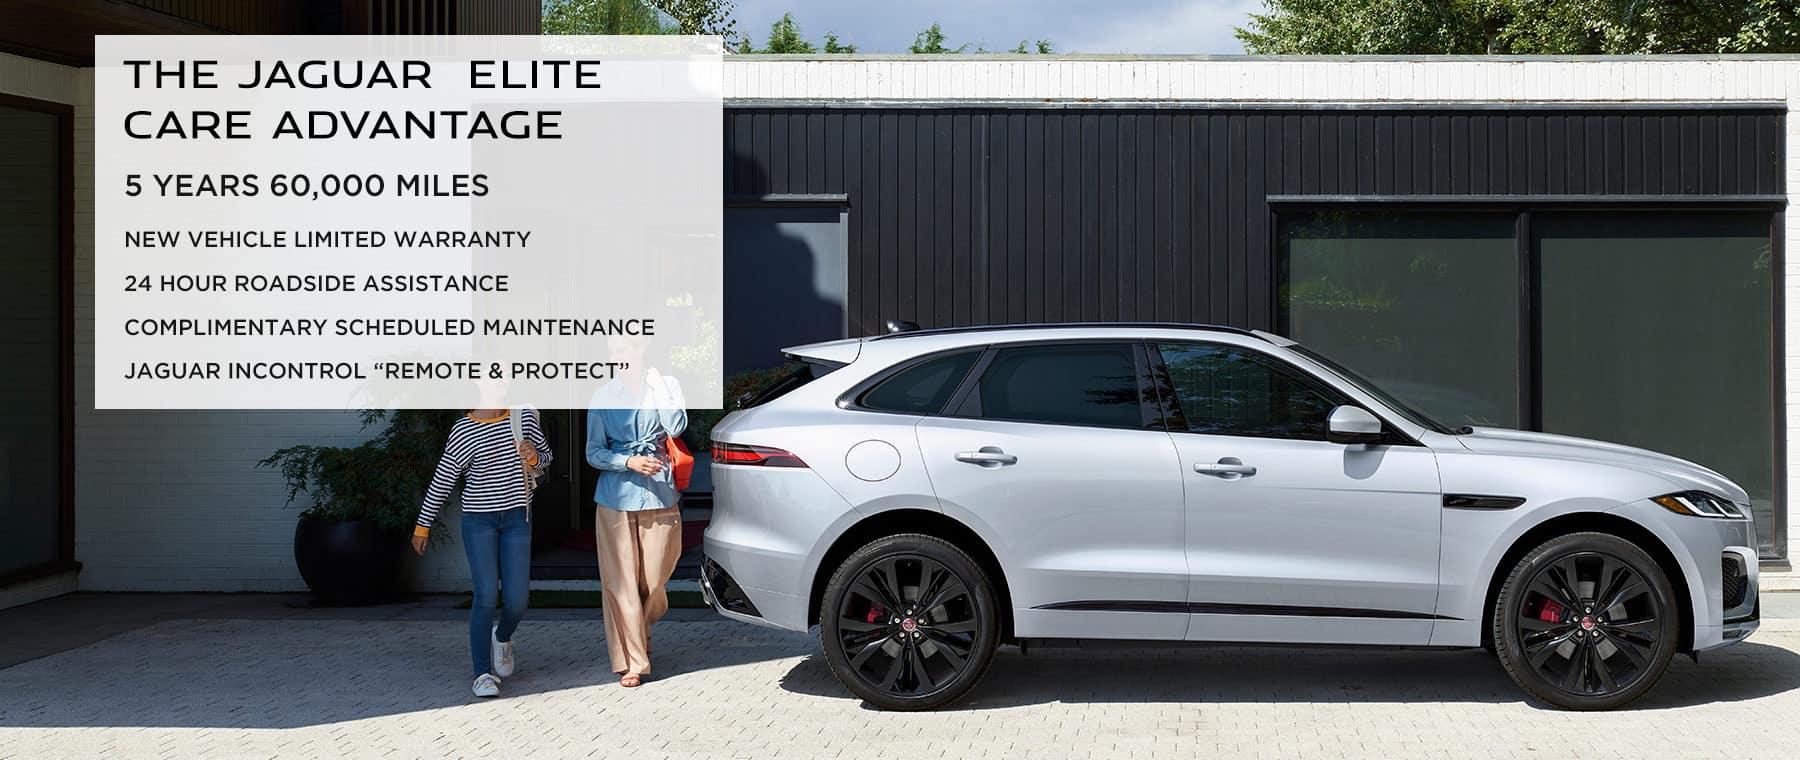 Jaguar Care Advantage